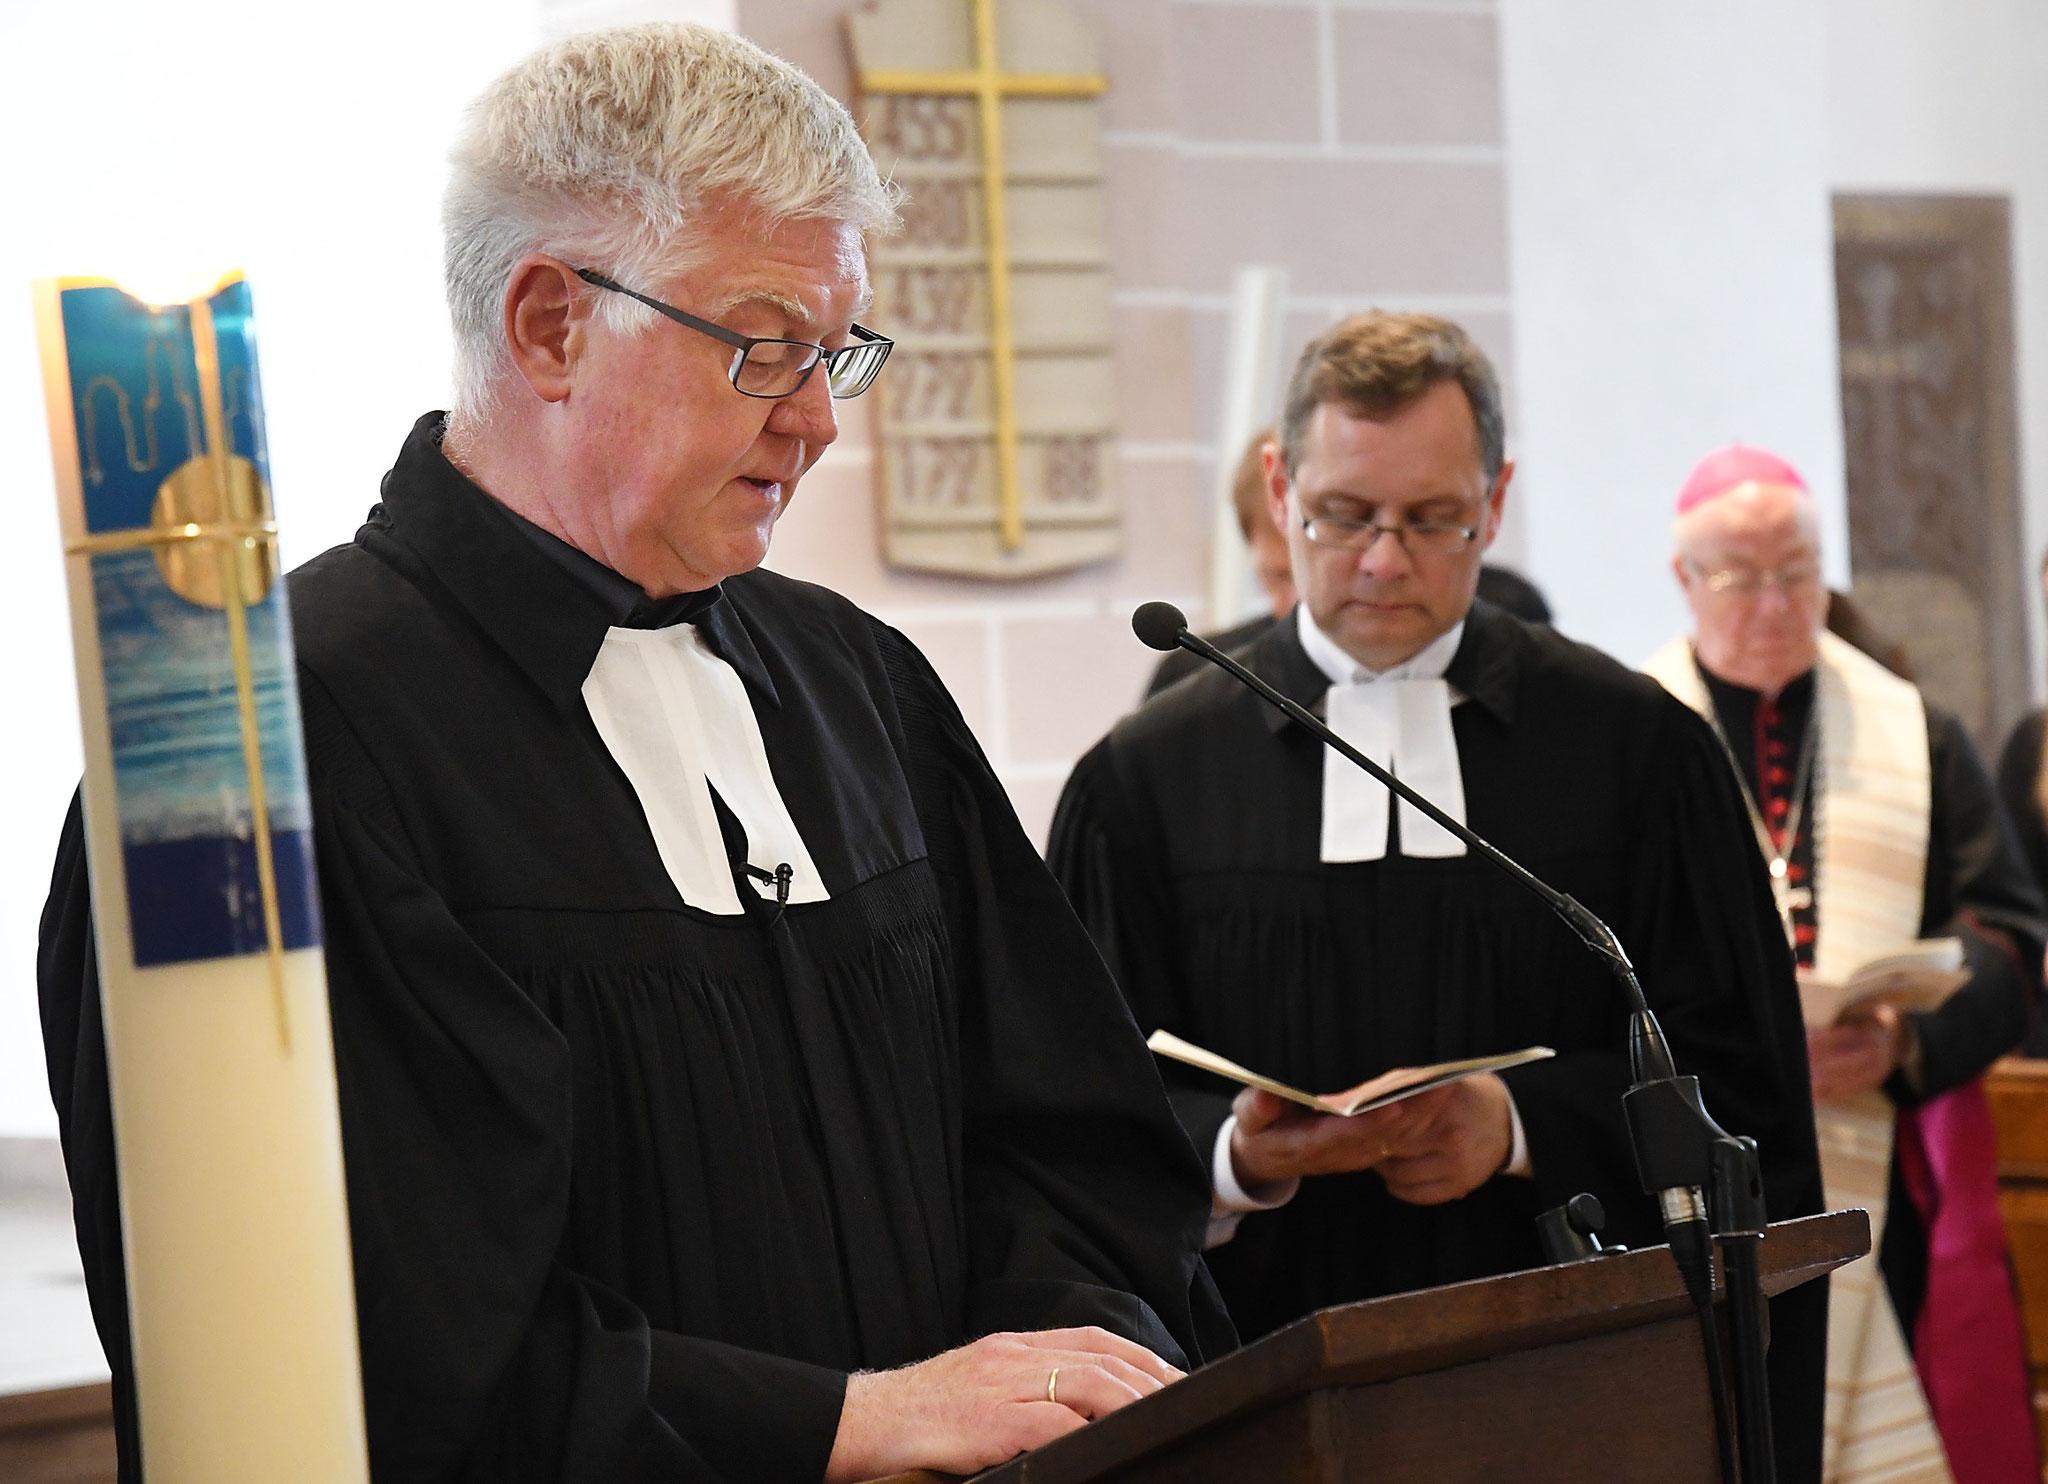 Pfarrer Dieter Maletz und Pfarrer Gunnar Wirth. Foto: Maria Hopp